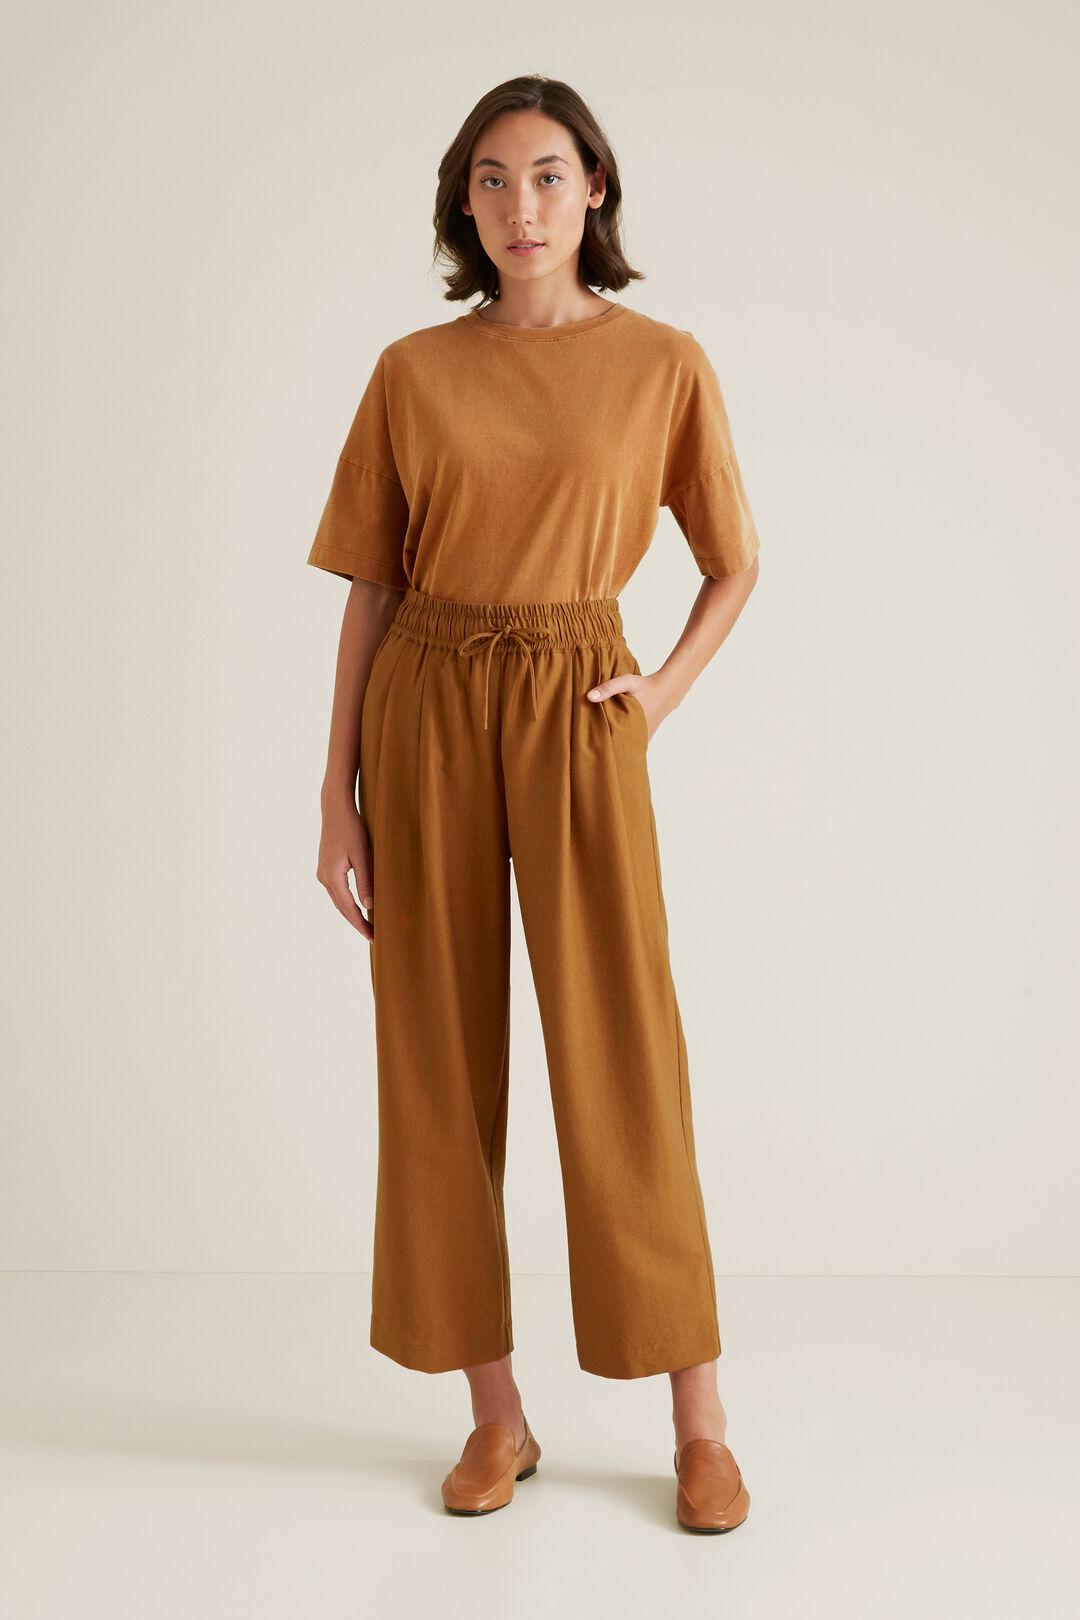 Wide Leg Drawstring Pant  SPICE  hi-res